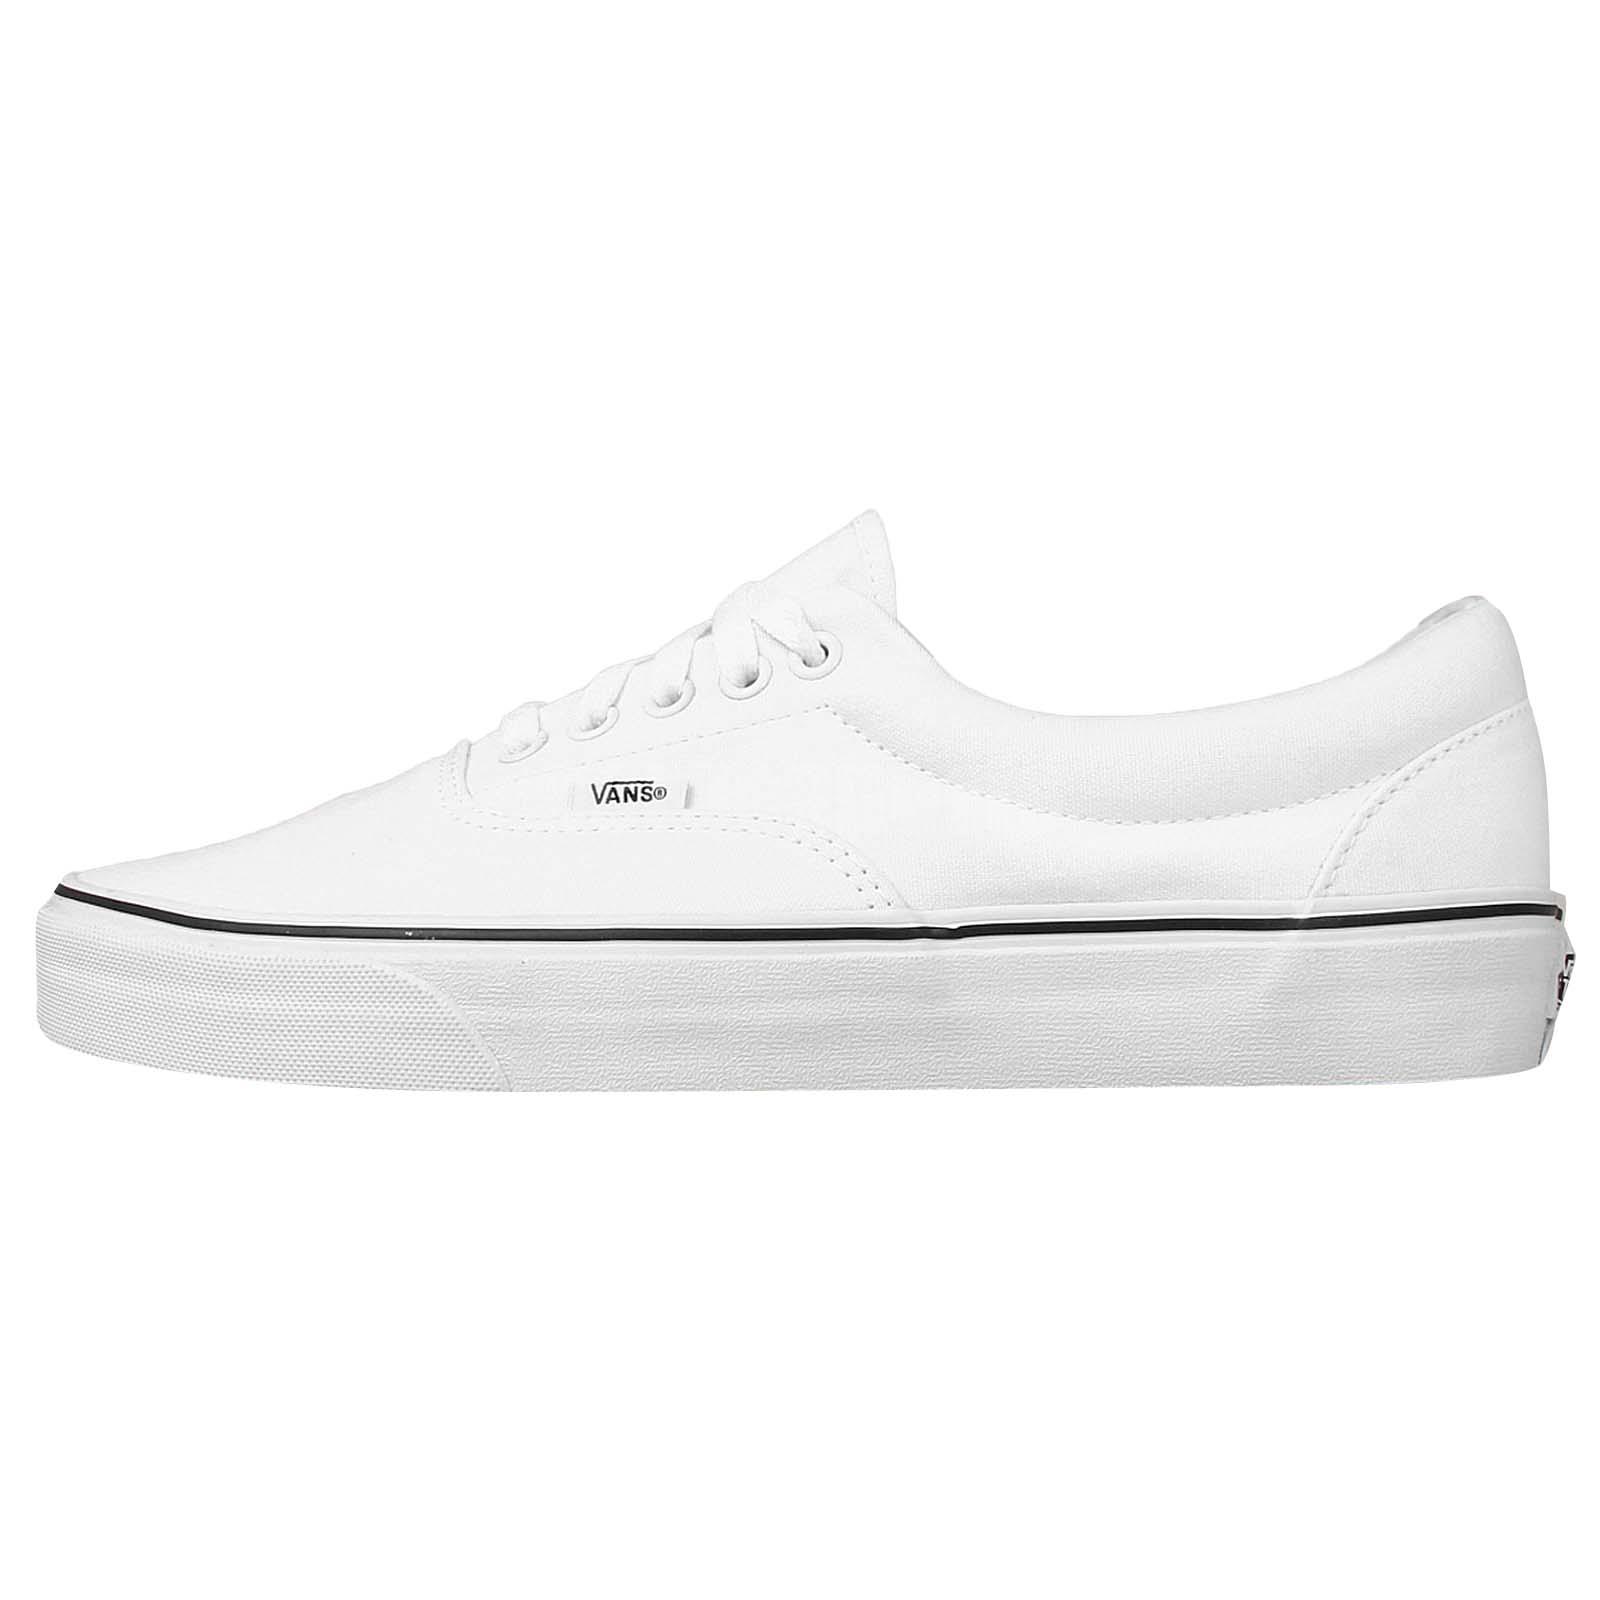 Vans Era White Classic Skateboarding Shoes Casual Sneakers C010251